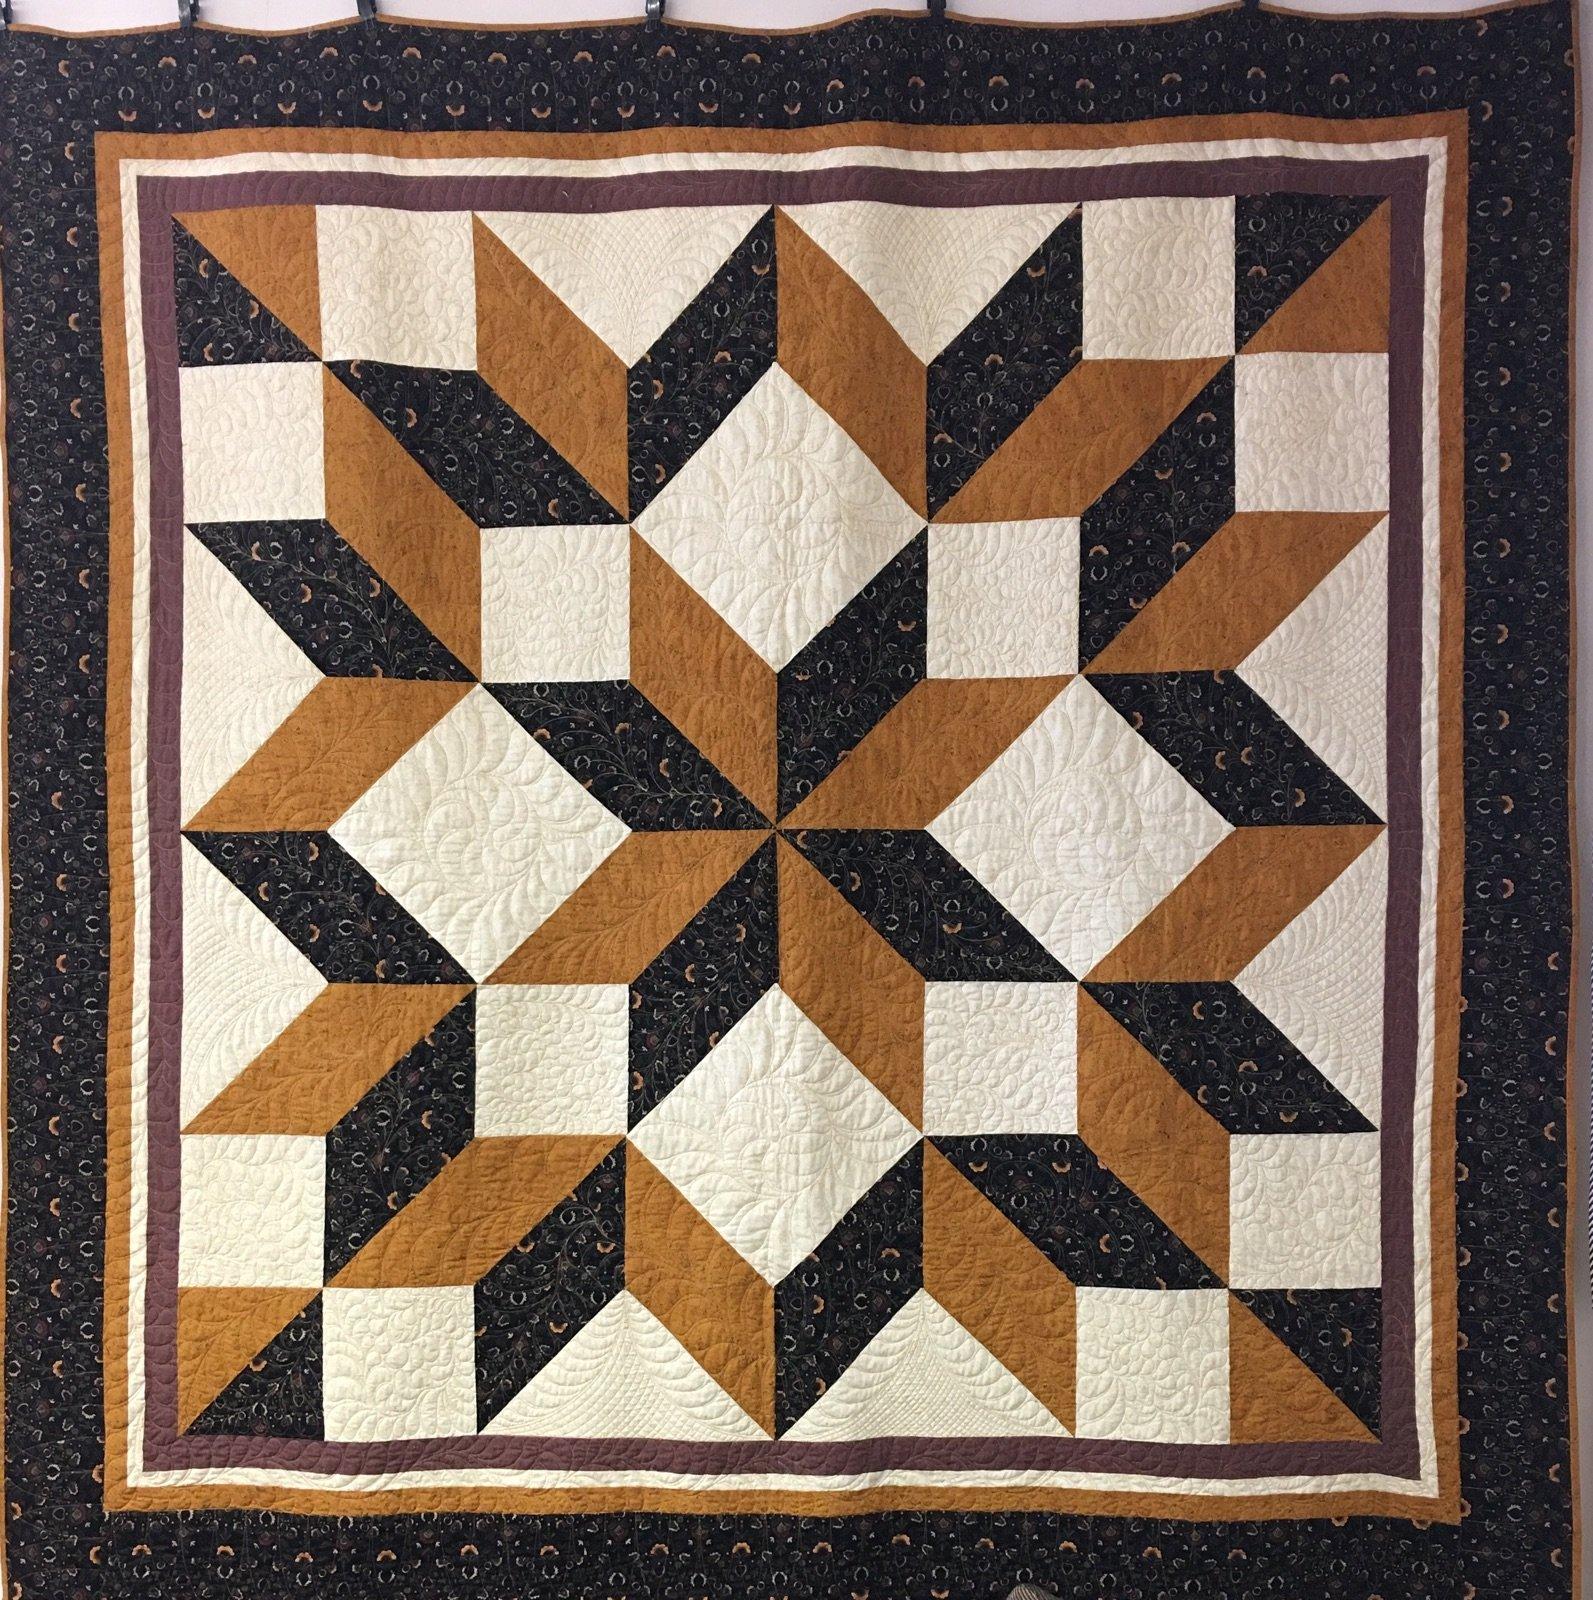 Carpenter Star Quilt